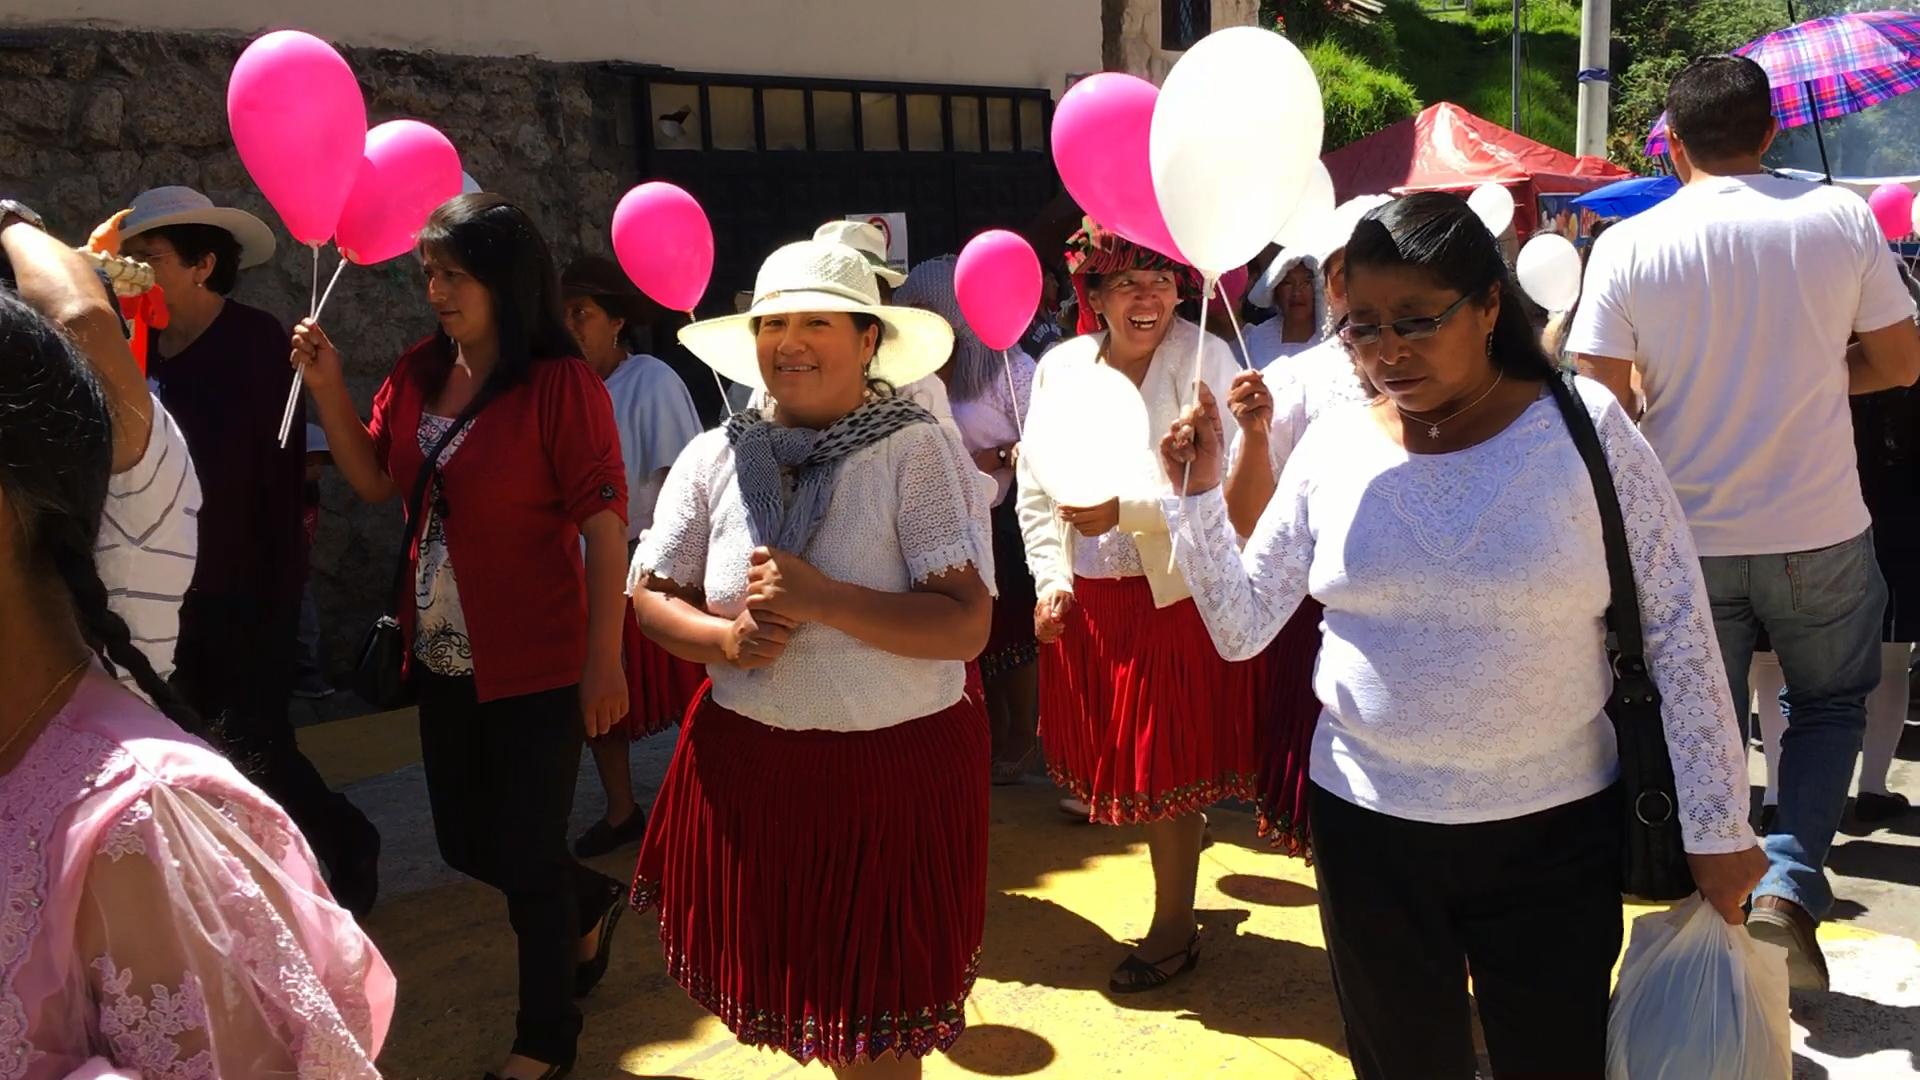 Turi Church Parade Cuenca Ecuador